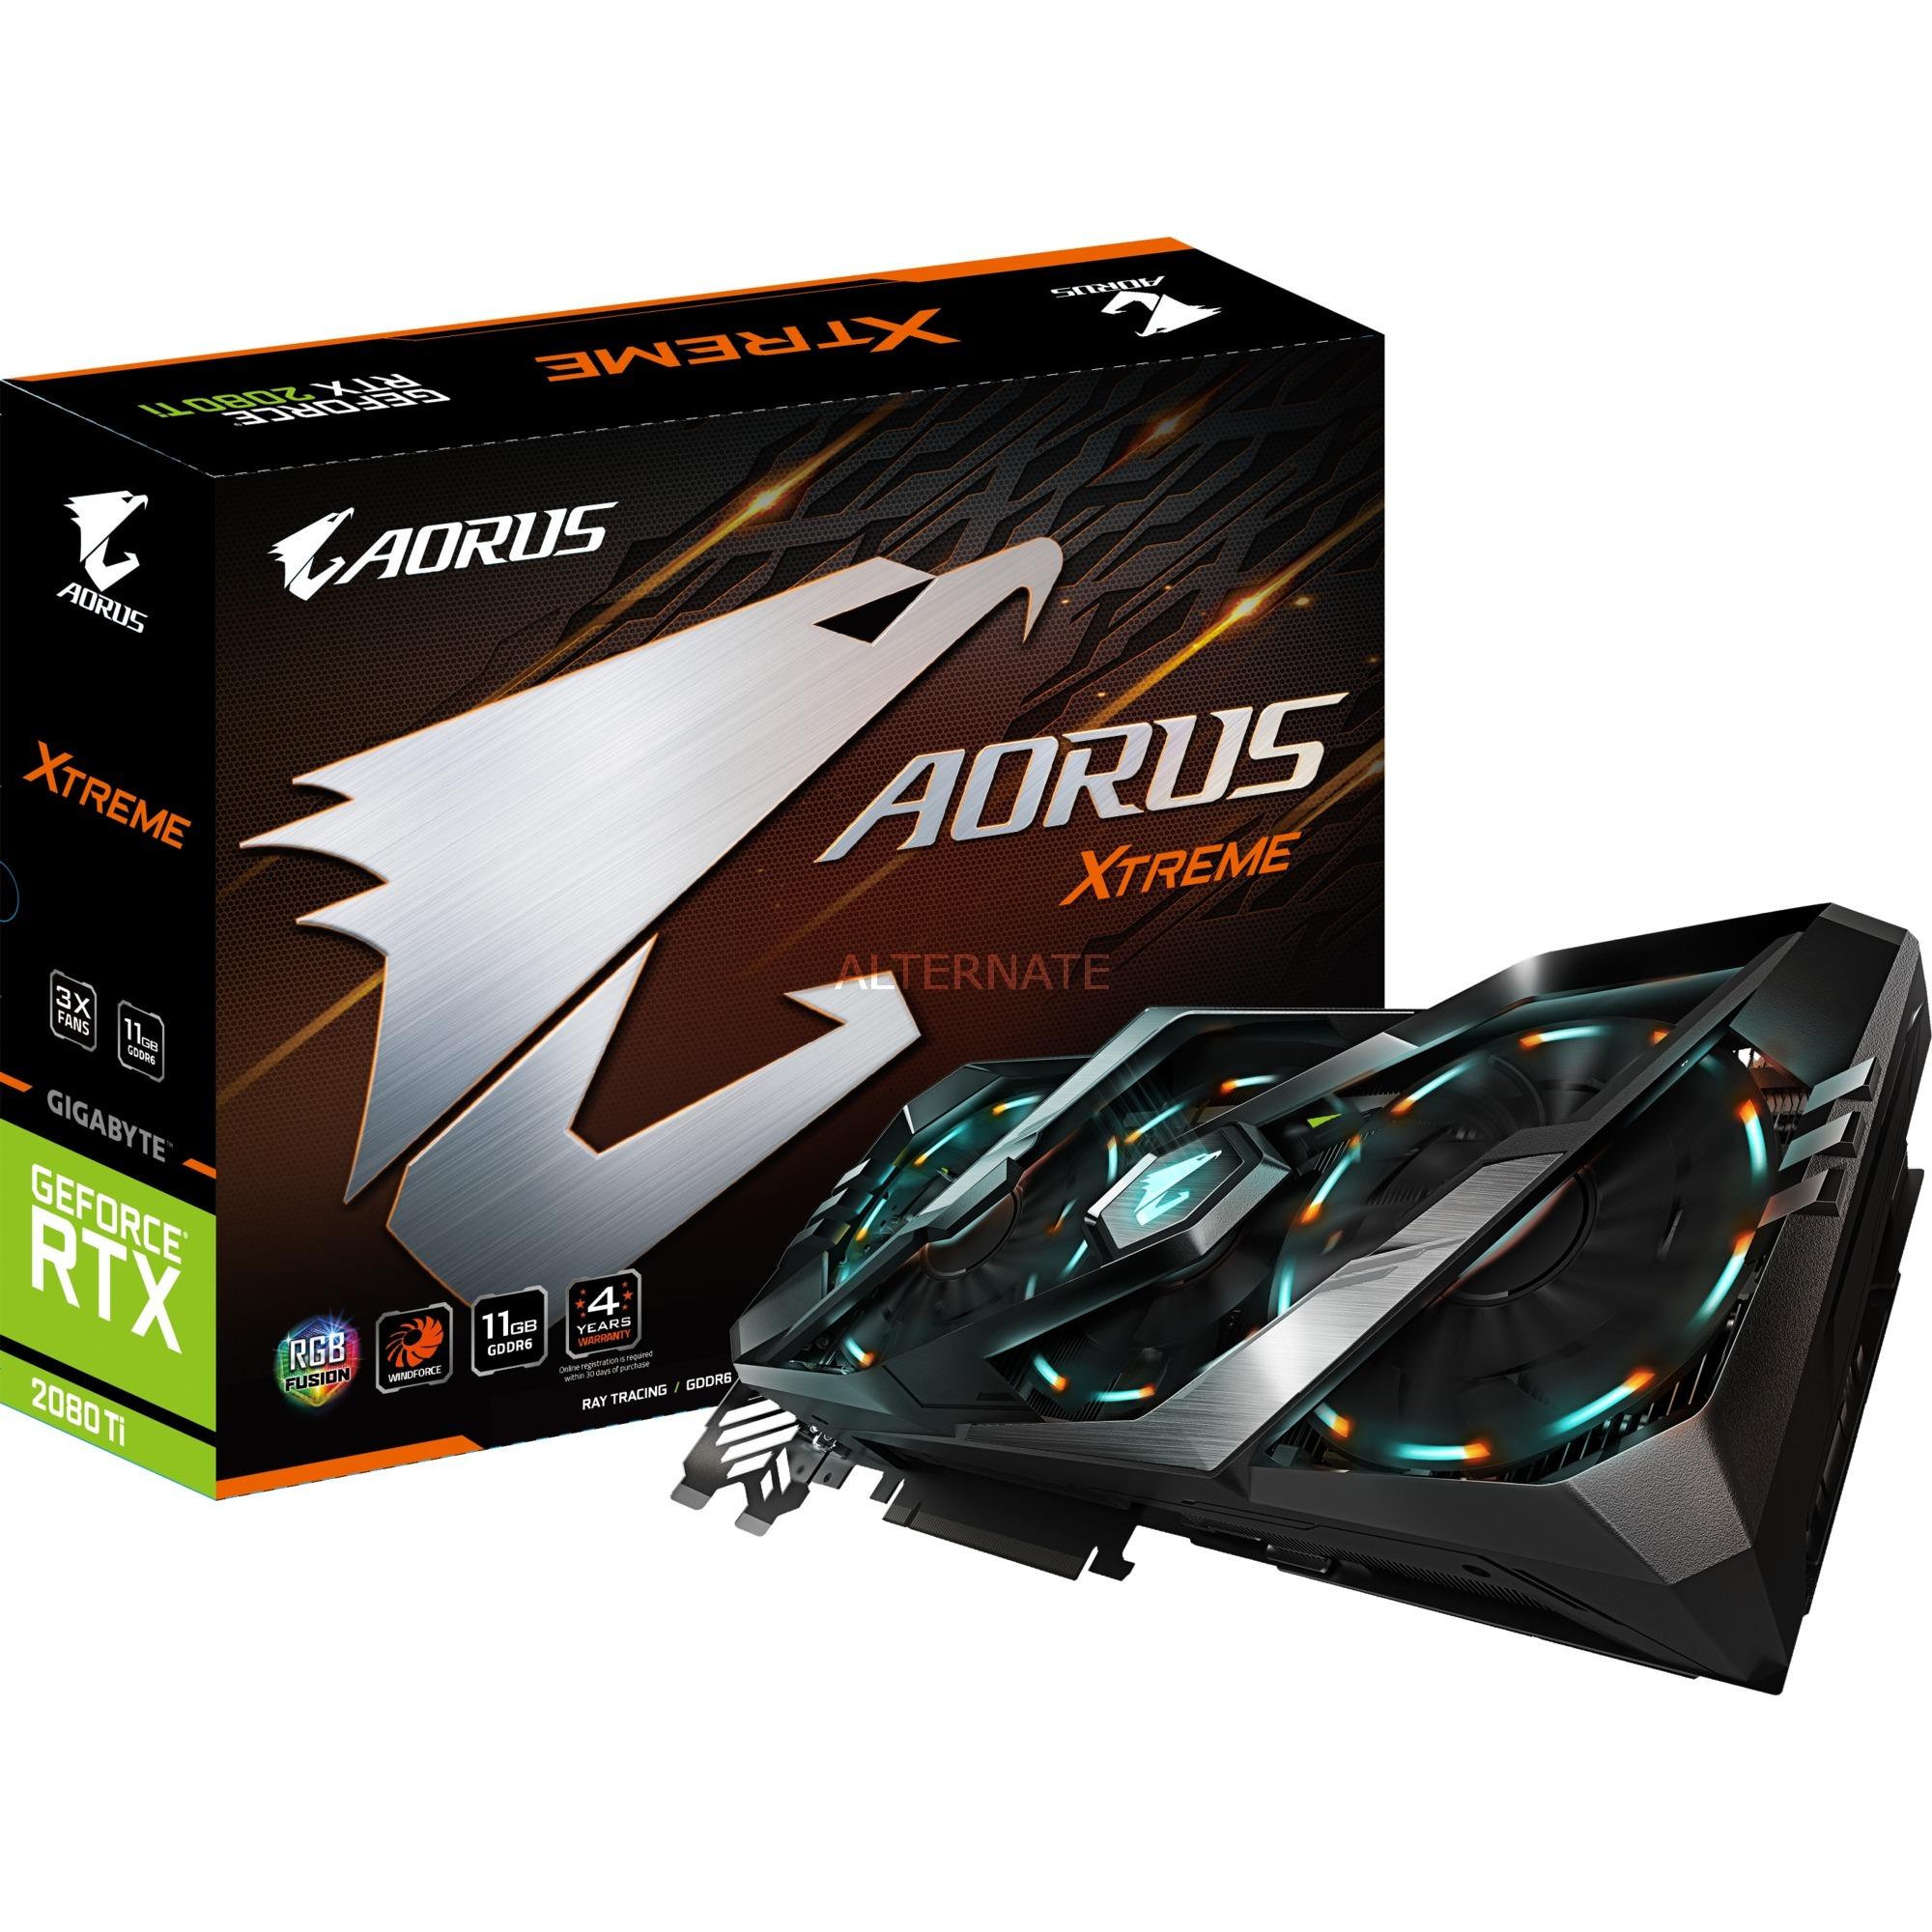 GIGABYTE GeForce RTX 2080 Ti AORUS XTREME 11G, Grafikkarte